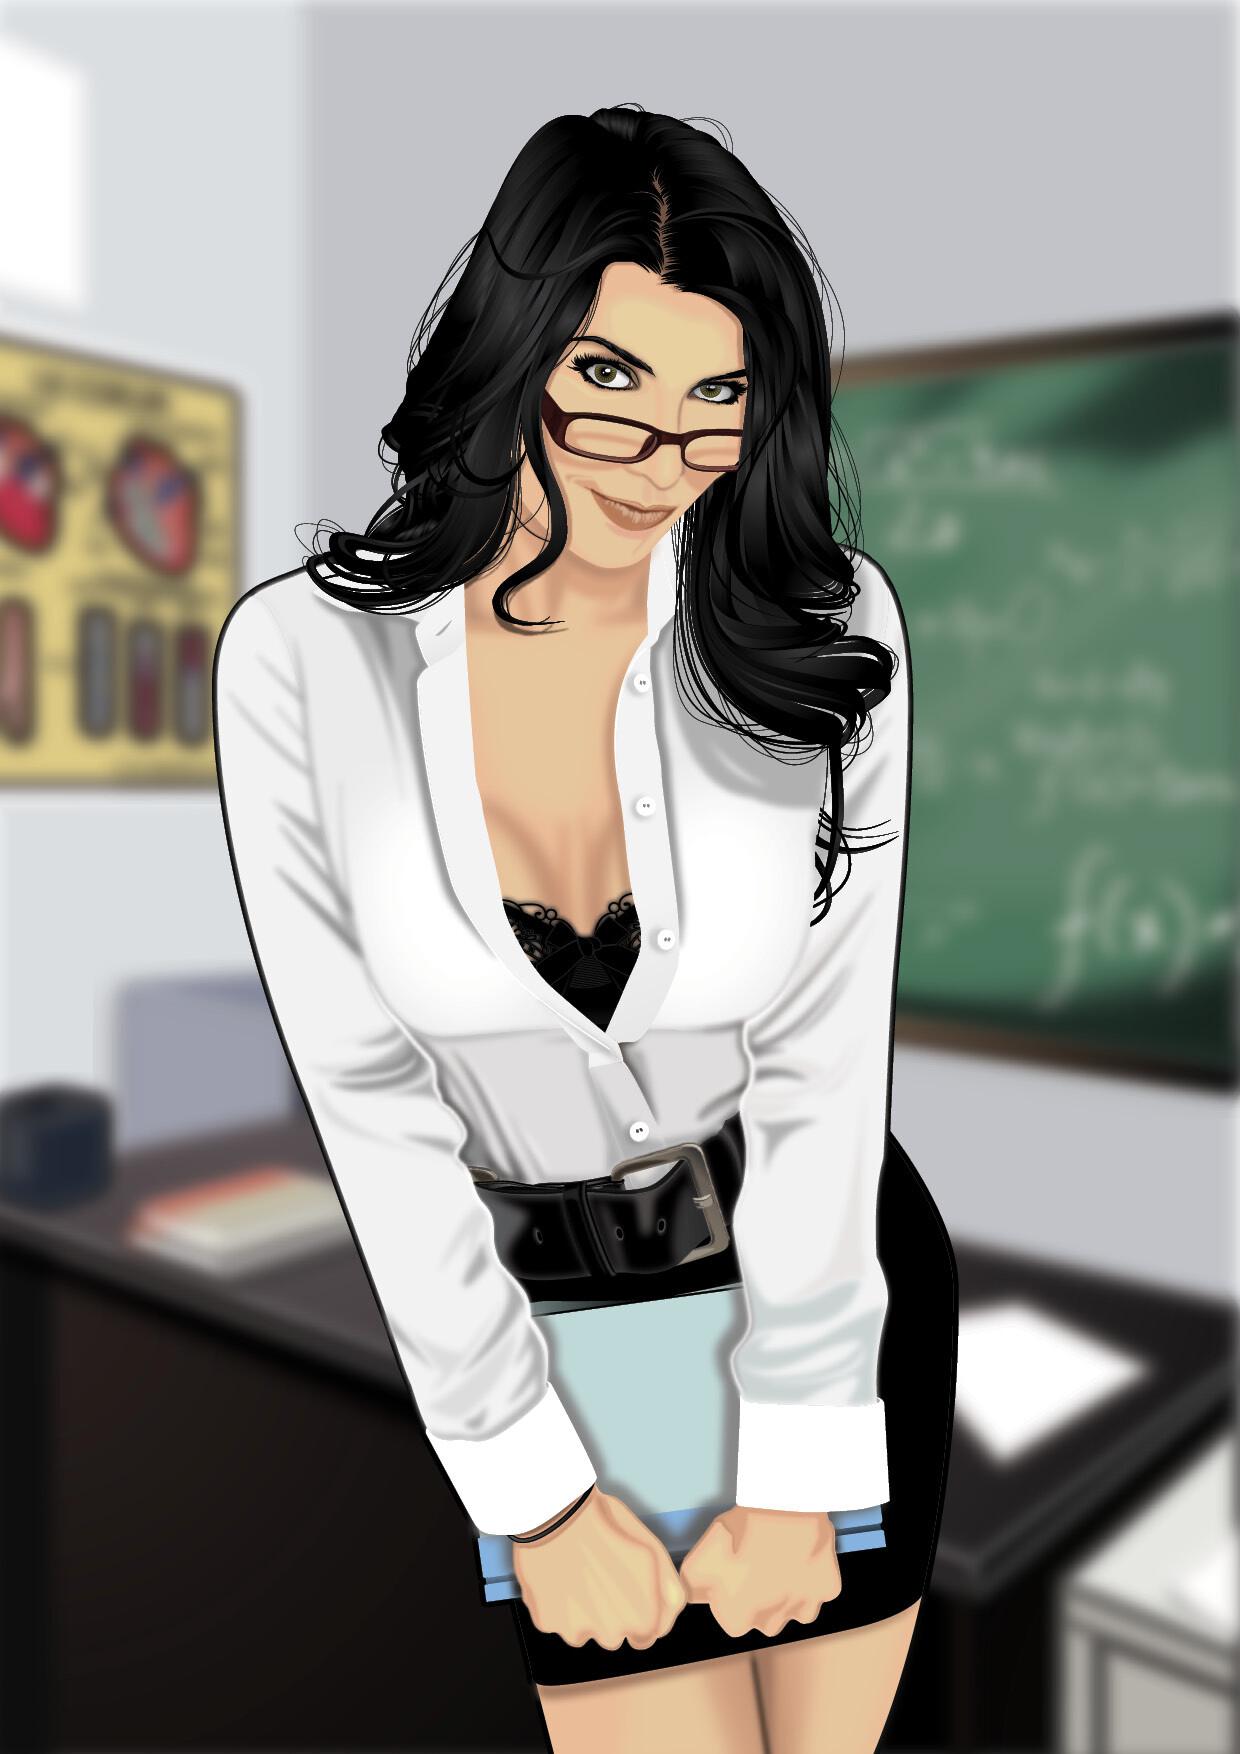 Teacher pics sexy NYC teacher